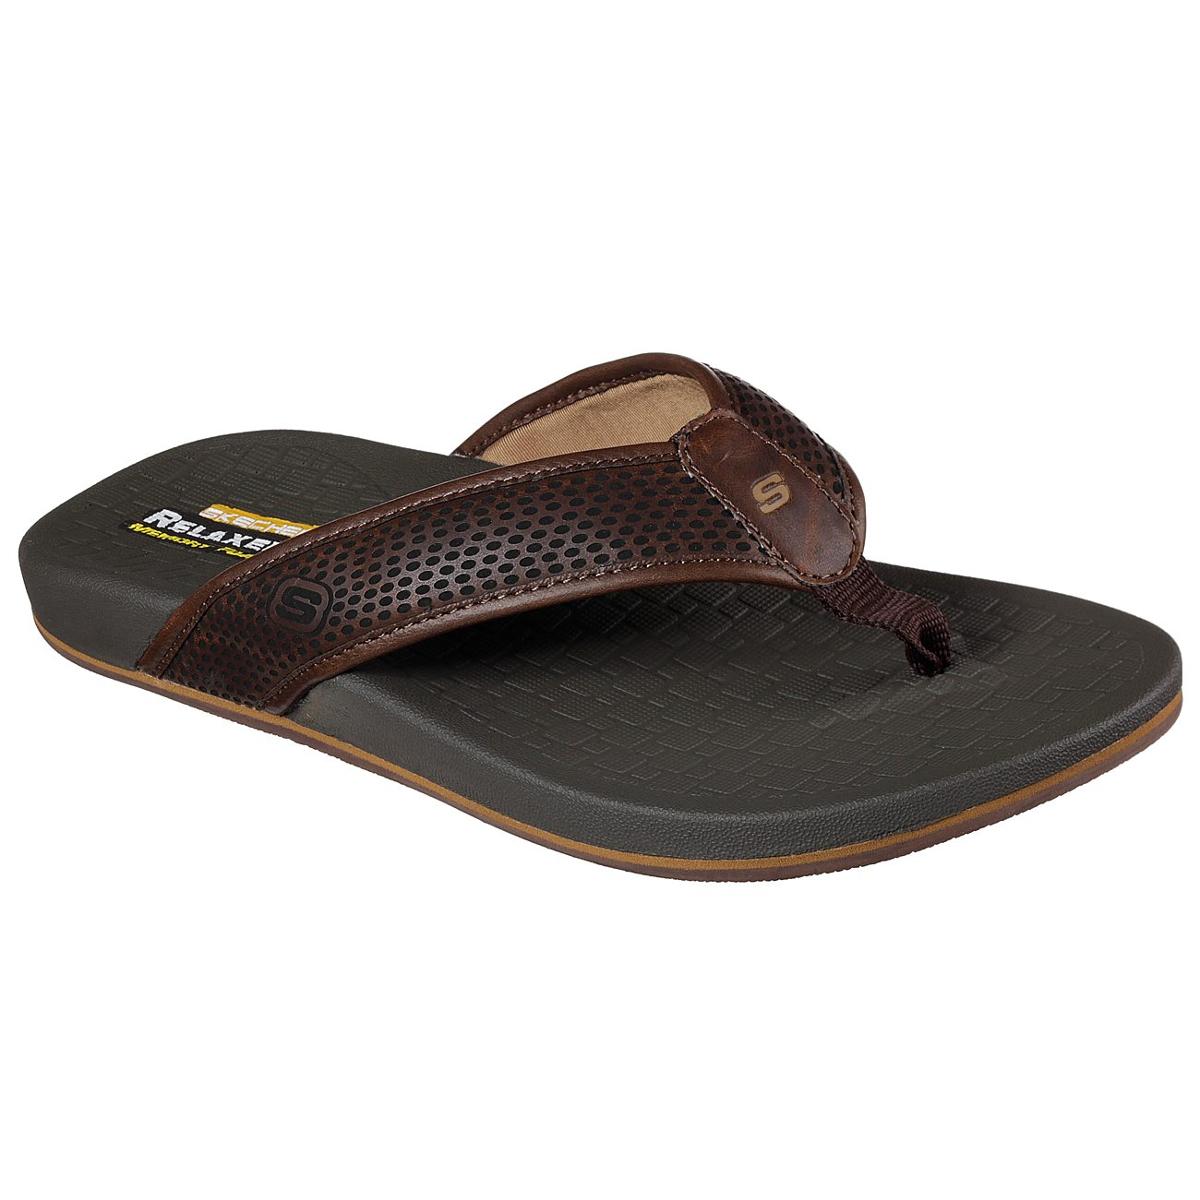 Skechers Men's Relaxed Fit: Pelem- Emiro Sandals - Brown, 11